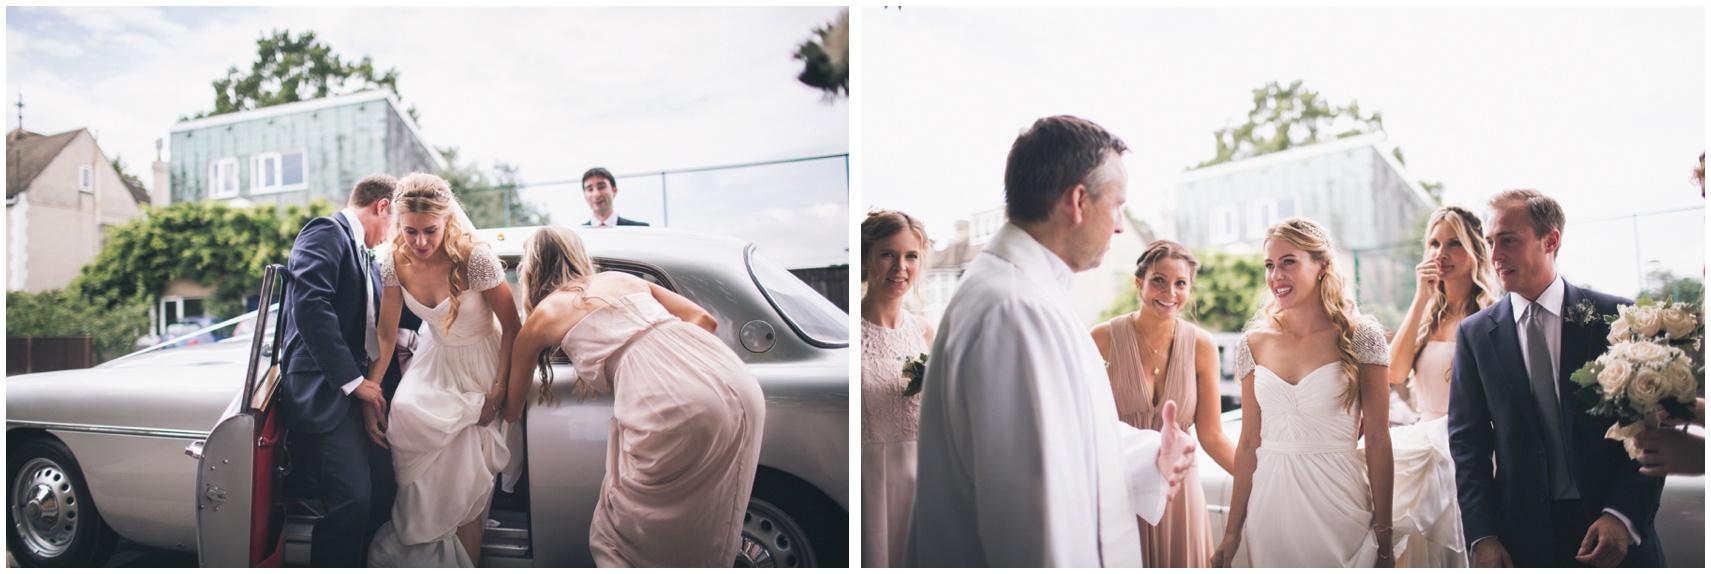 BMC Wedding photography Rutland_0283.jpg